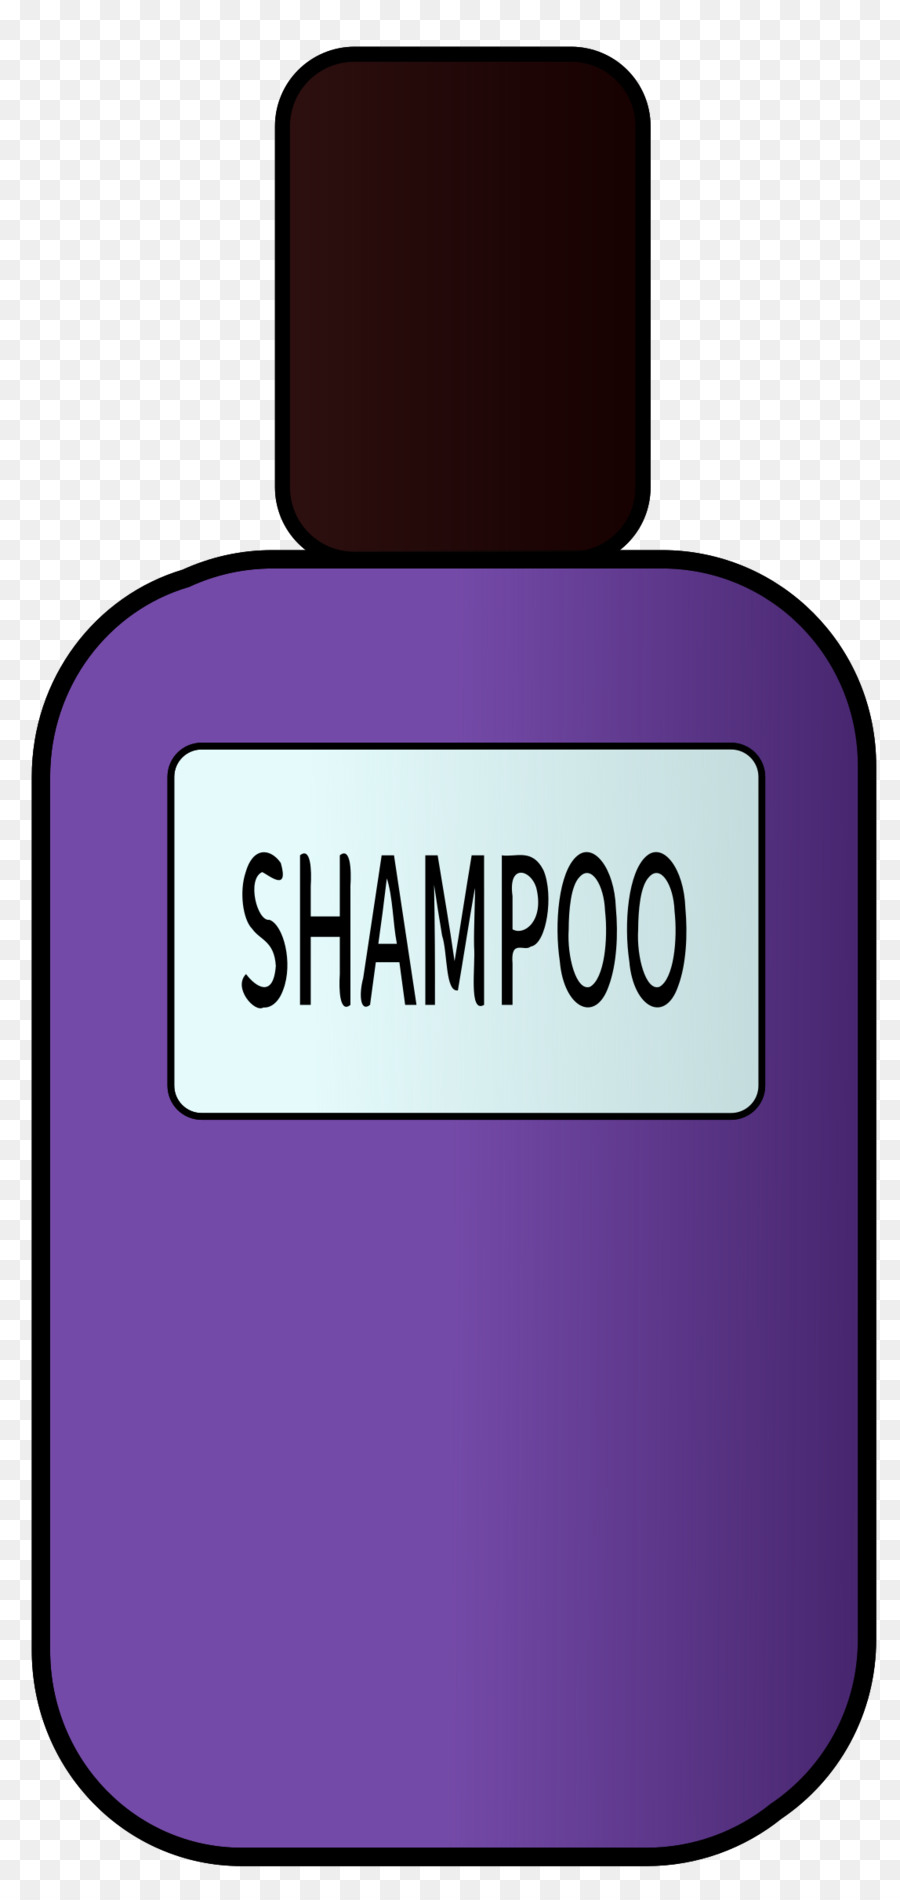 Shampoo images clipart vector free stock Hair Cartoon clipart - Perfume, Shampoo, Purple, transparent ... vector free stock